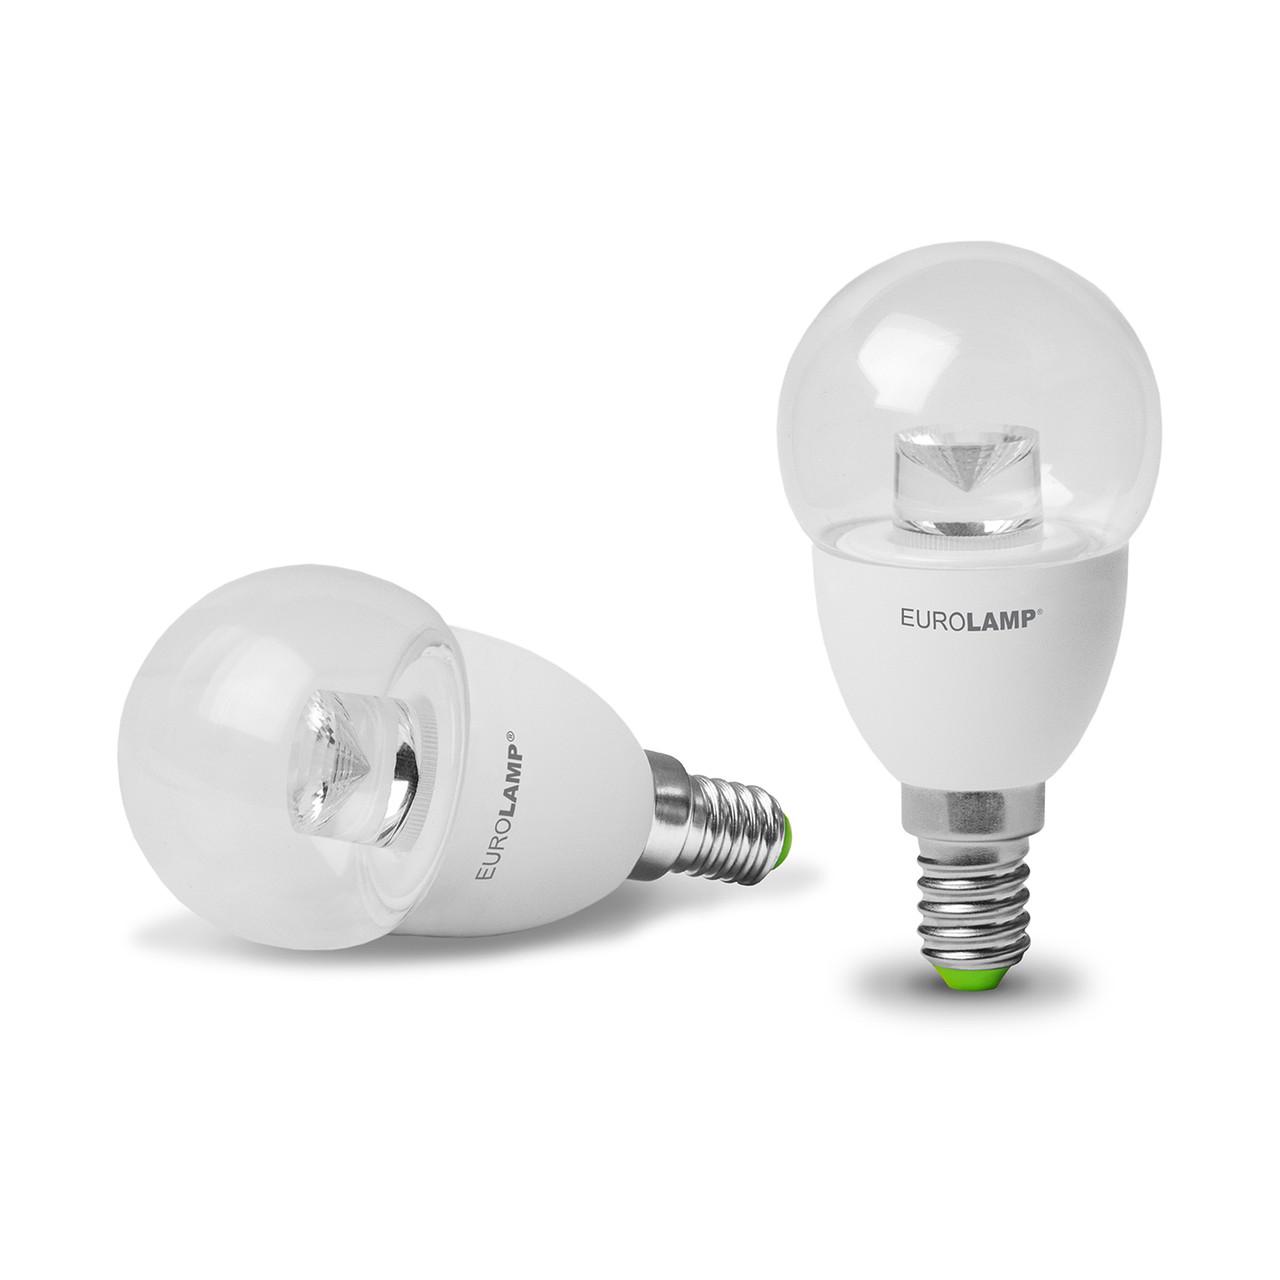 EUROLAMP LED Лампа ЕКО G45 5W E14 3000K(прозрачная), фото 1